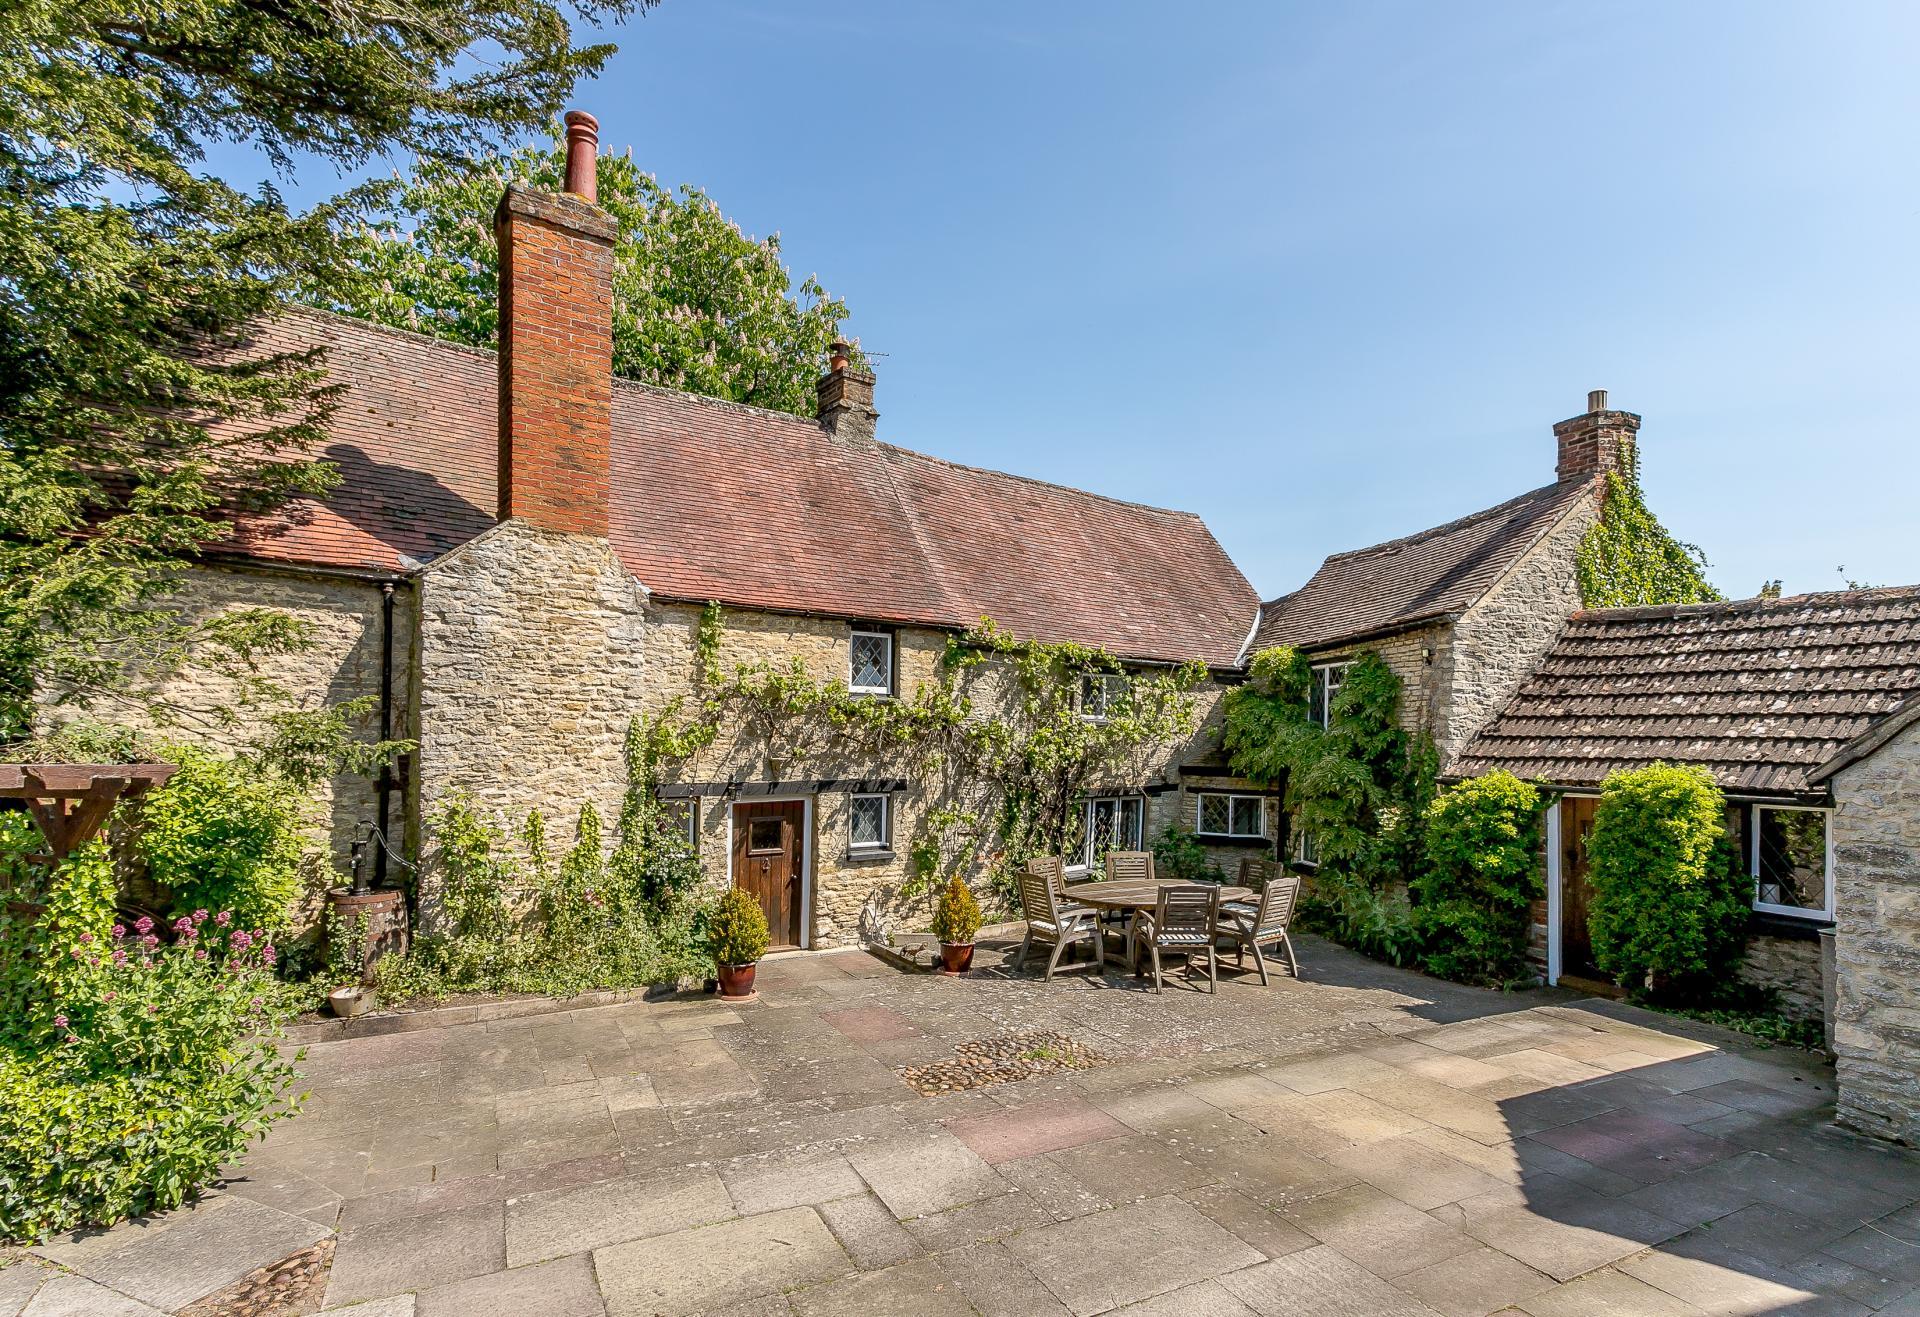 oxfordshire village leafy stone farmhouse cottage.jpg